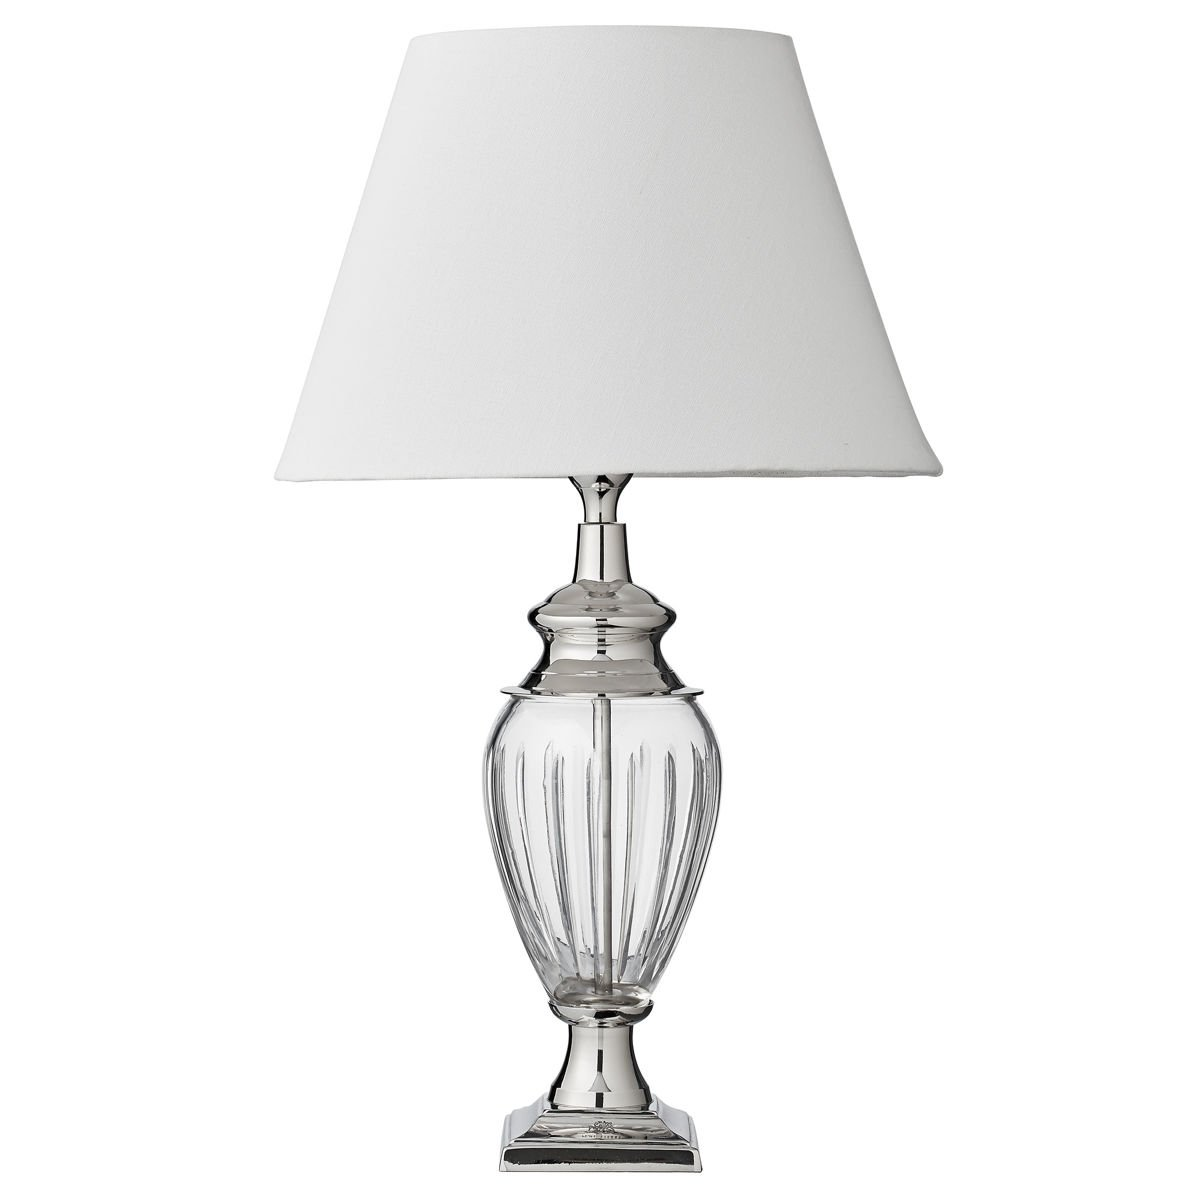 Lampa Deanna 40 X 11 X 11 Cm Lene Bjerre